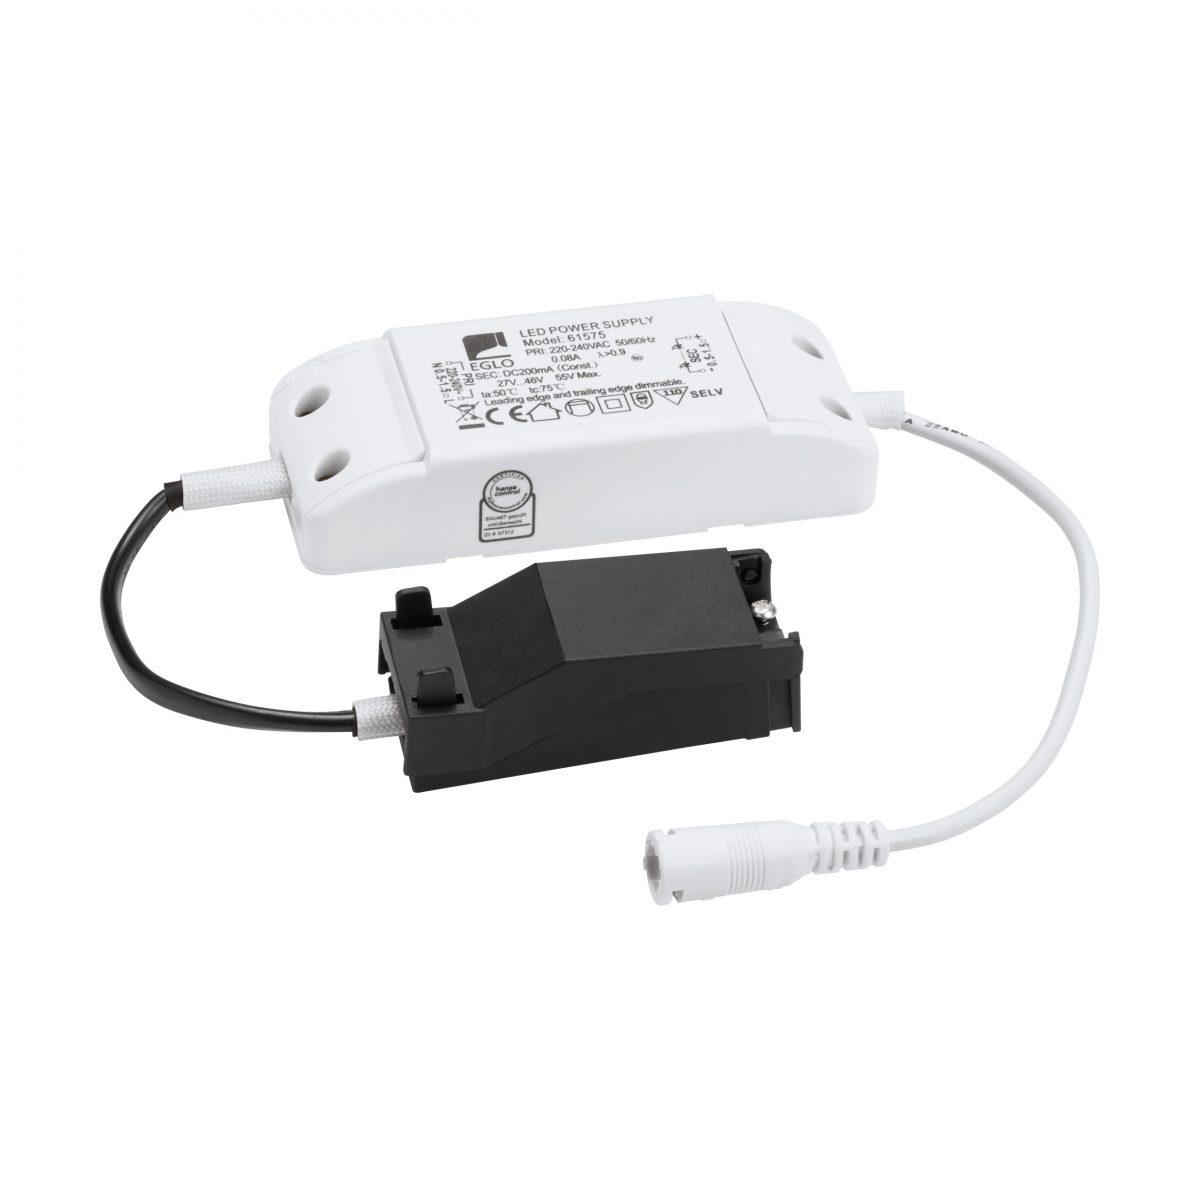 Трансформатор DRIVER 200MA/PROFESSIONAL LIGHTING EGLO 61575 - Фото №28